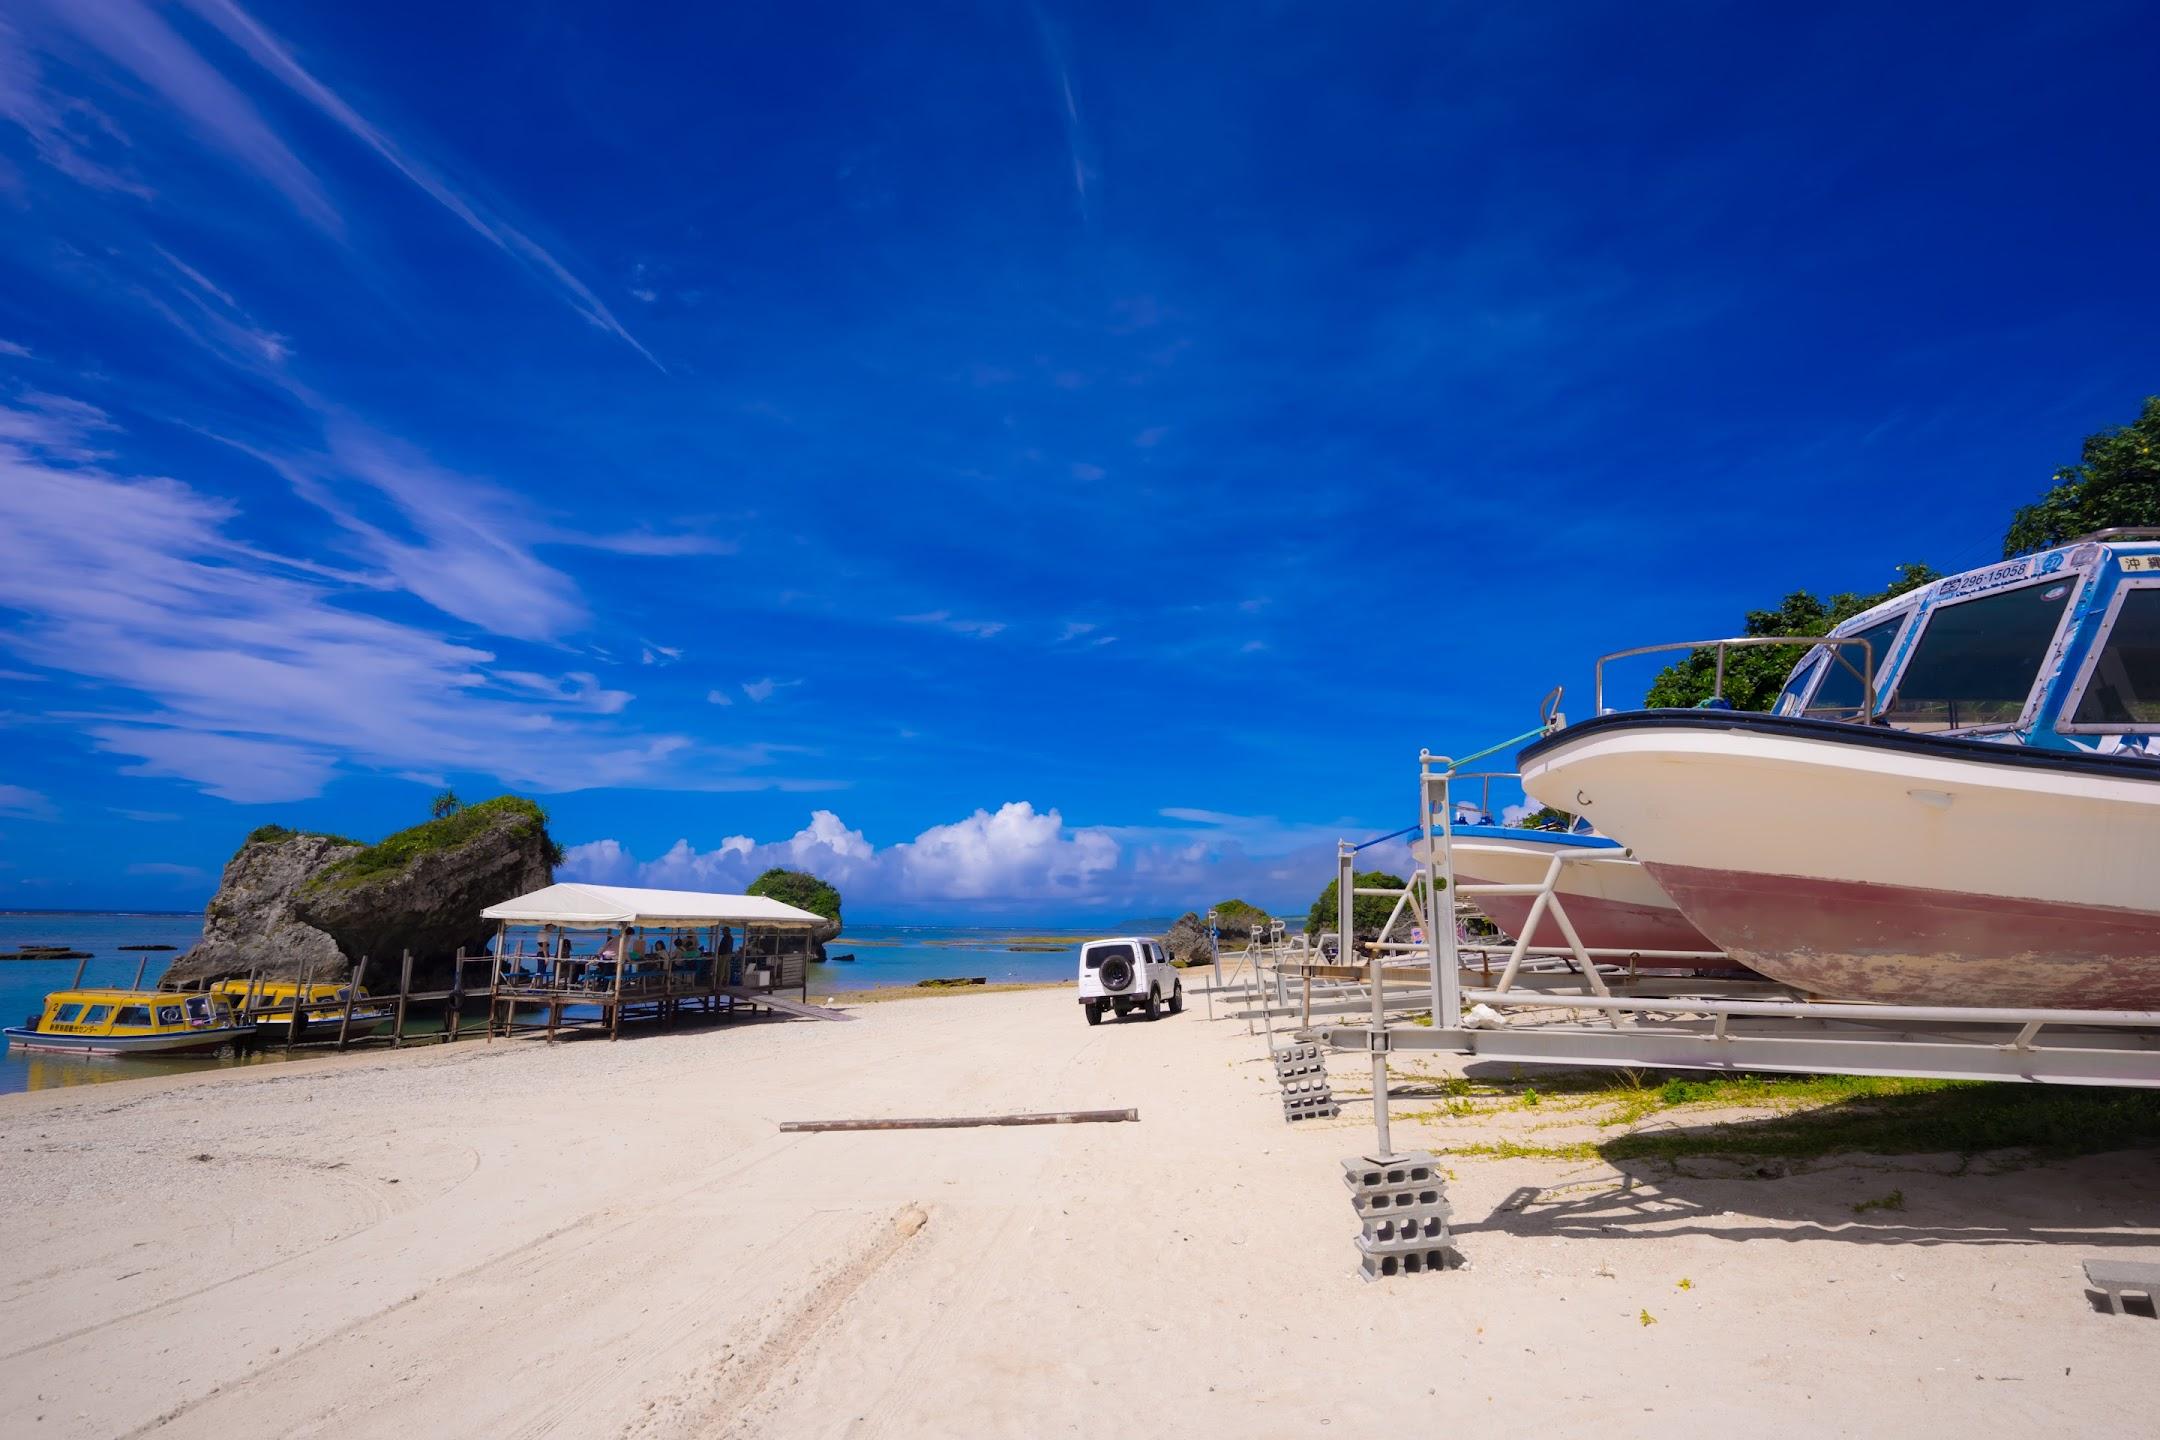 Okinawa Mibaru Beach3